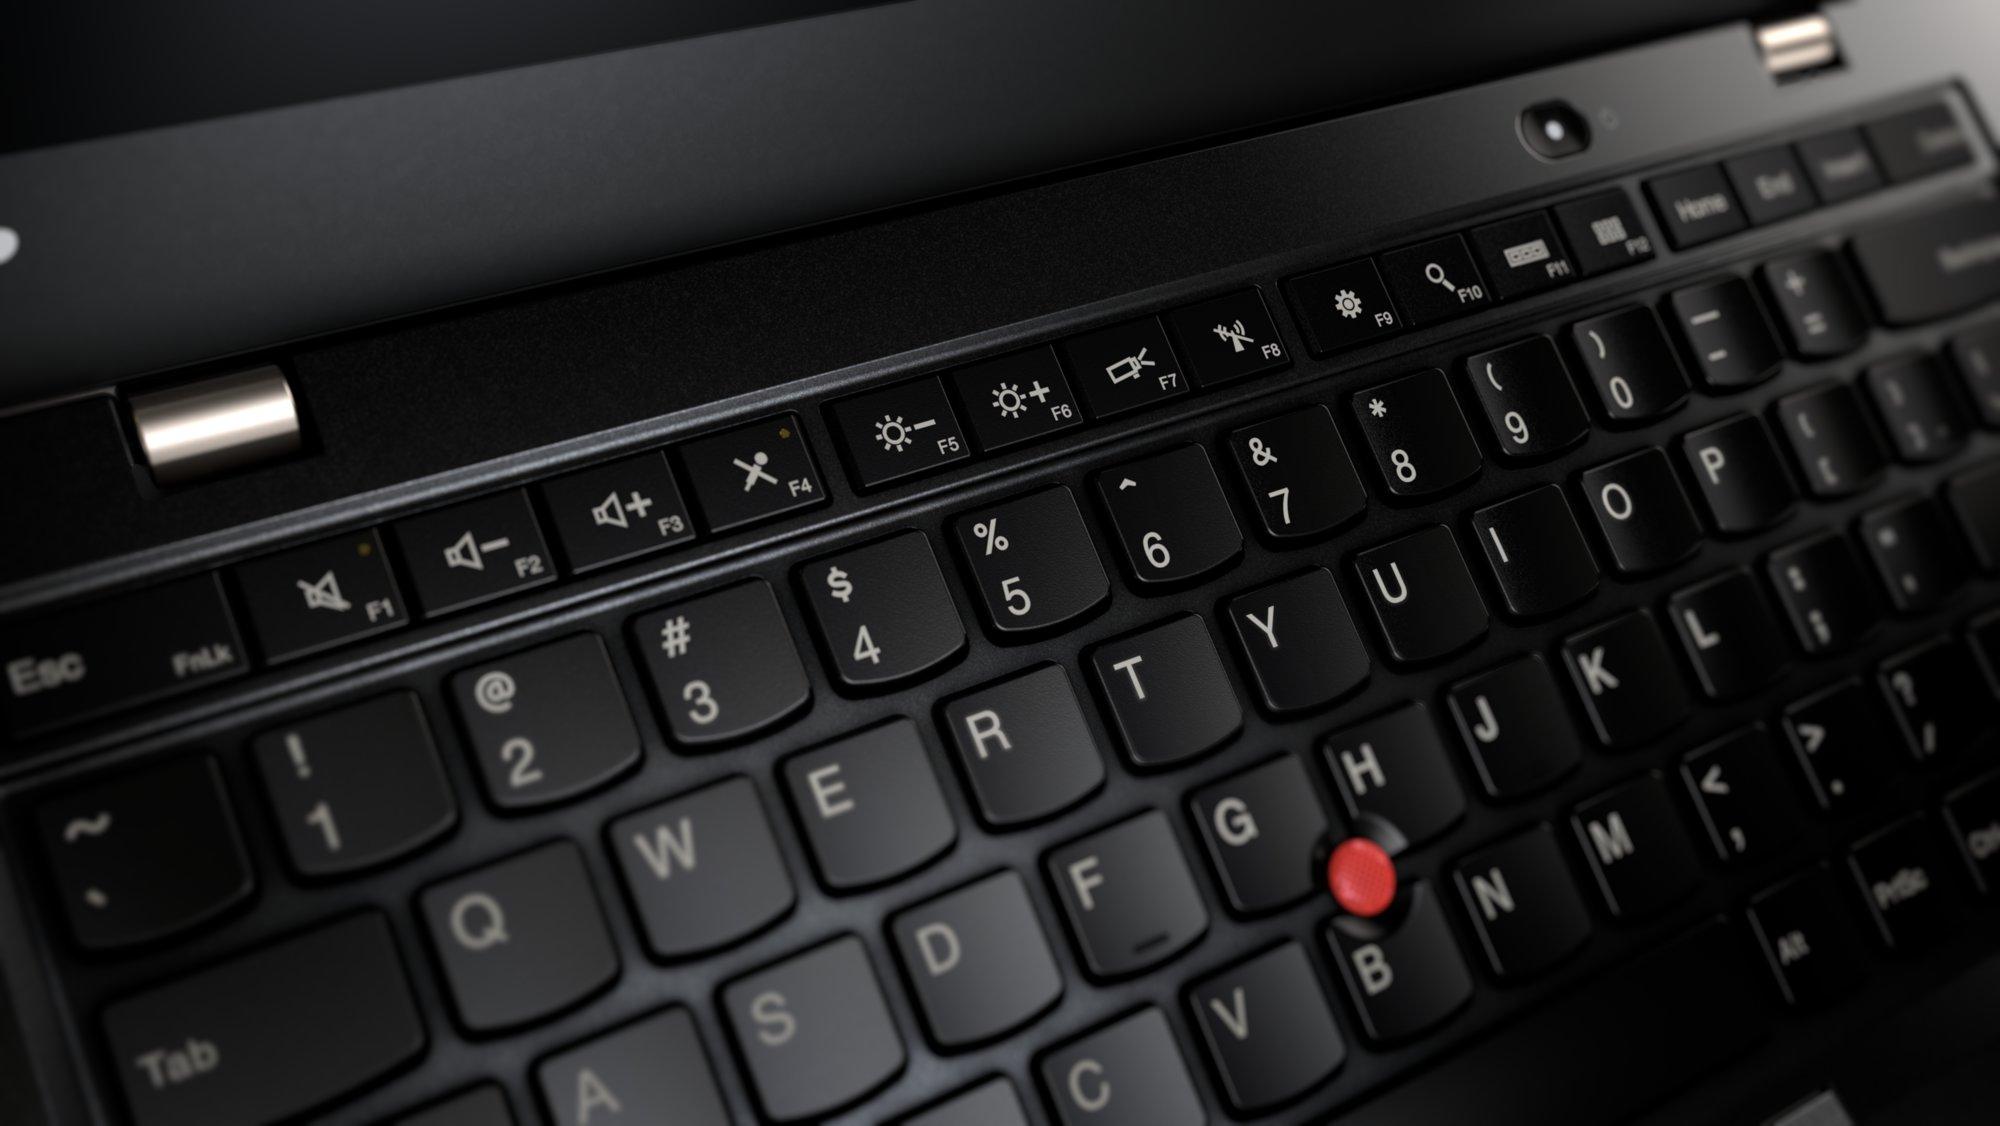 Lenovo ThinkPad X1 Carbon 3rd